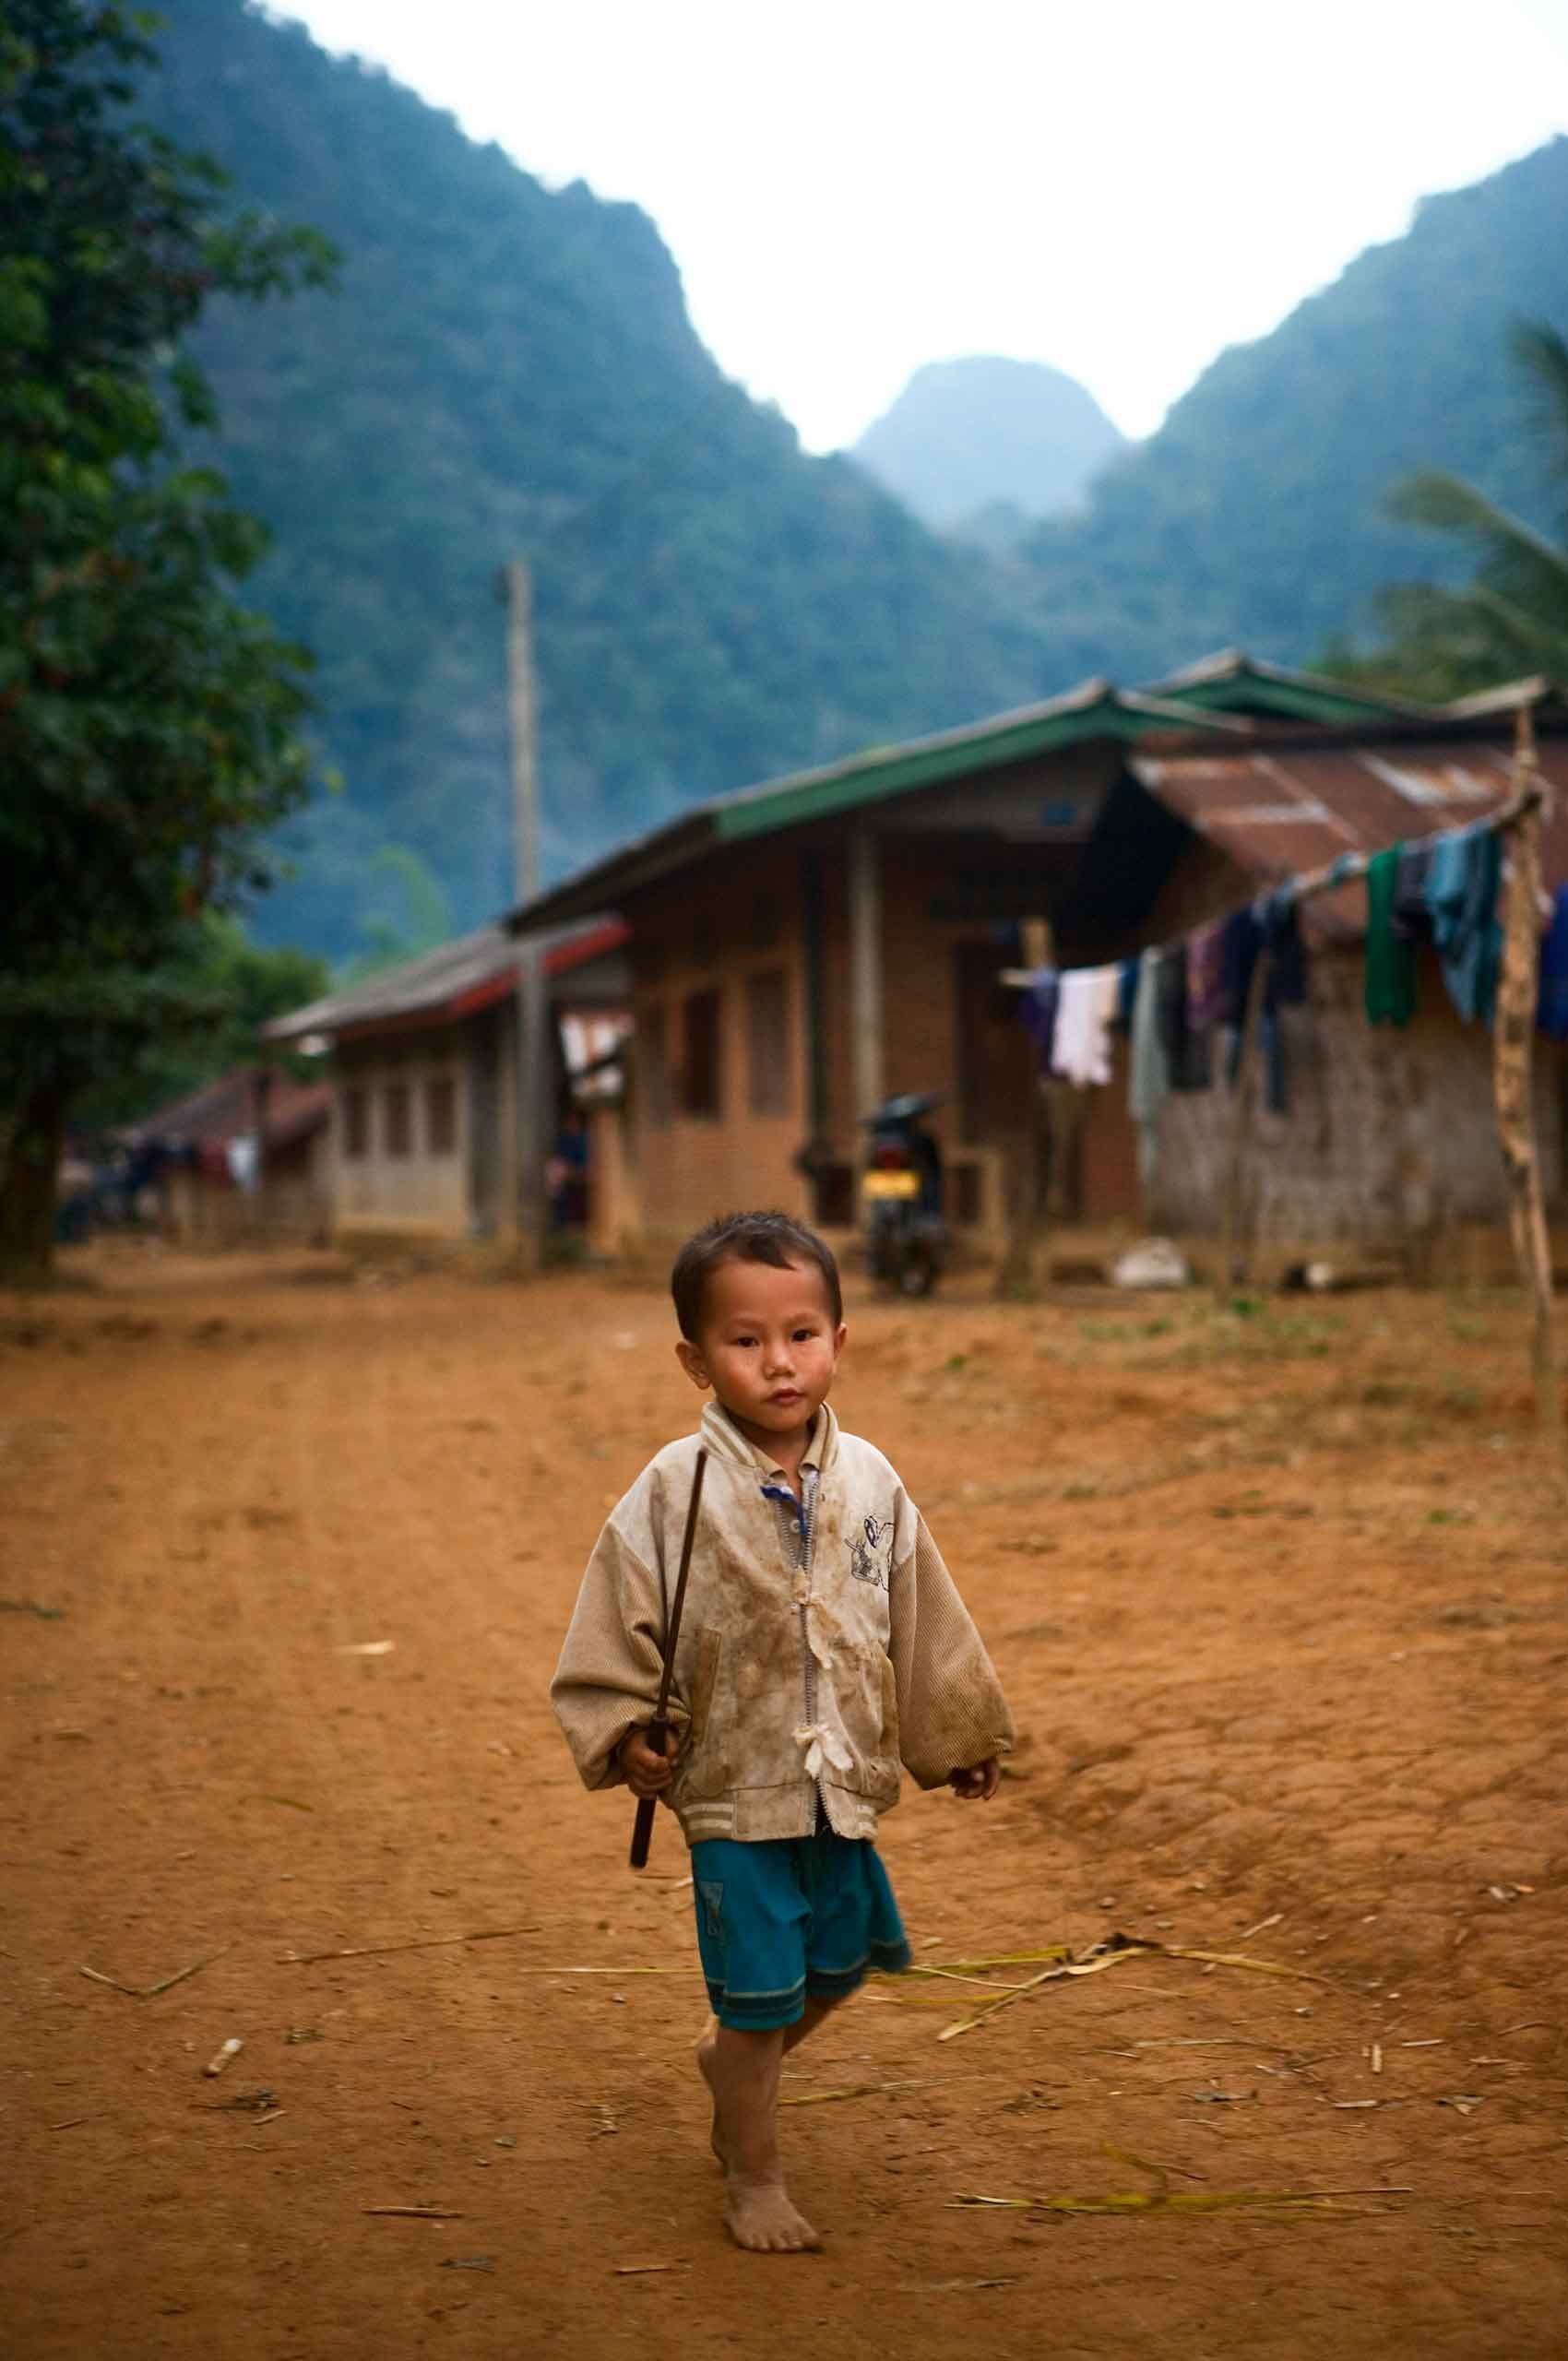 boy-vanvien-laos-by-henrikolundphotography.jpg